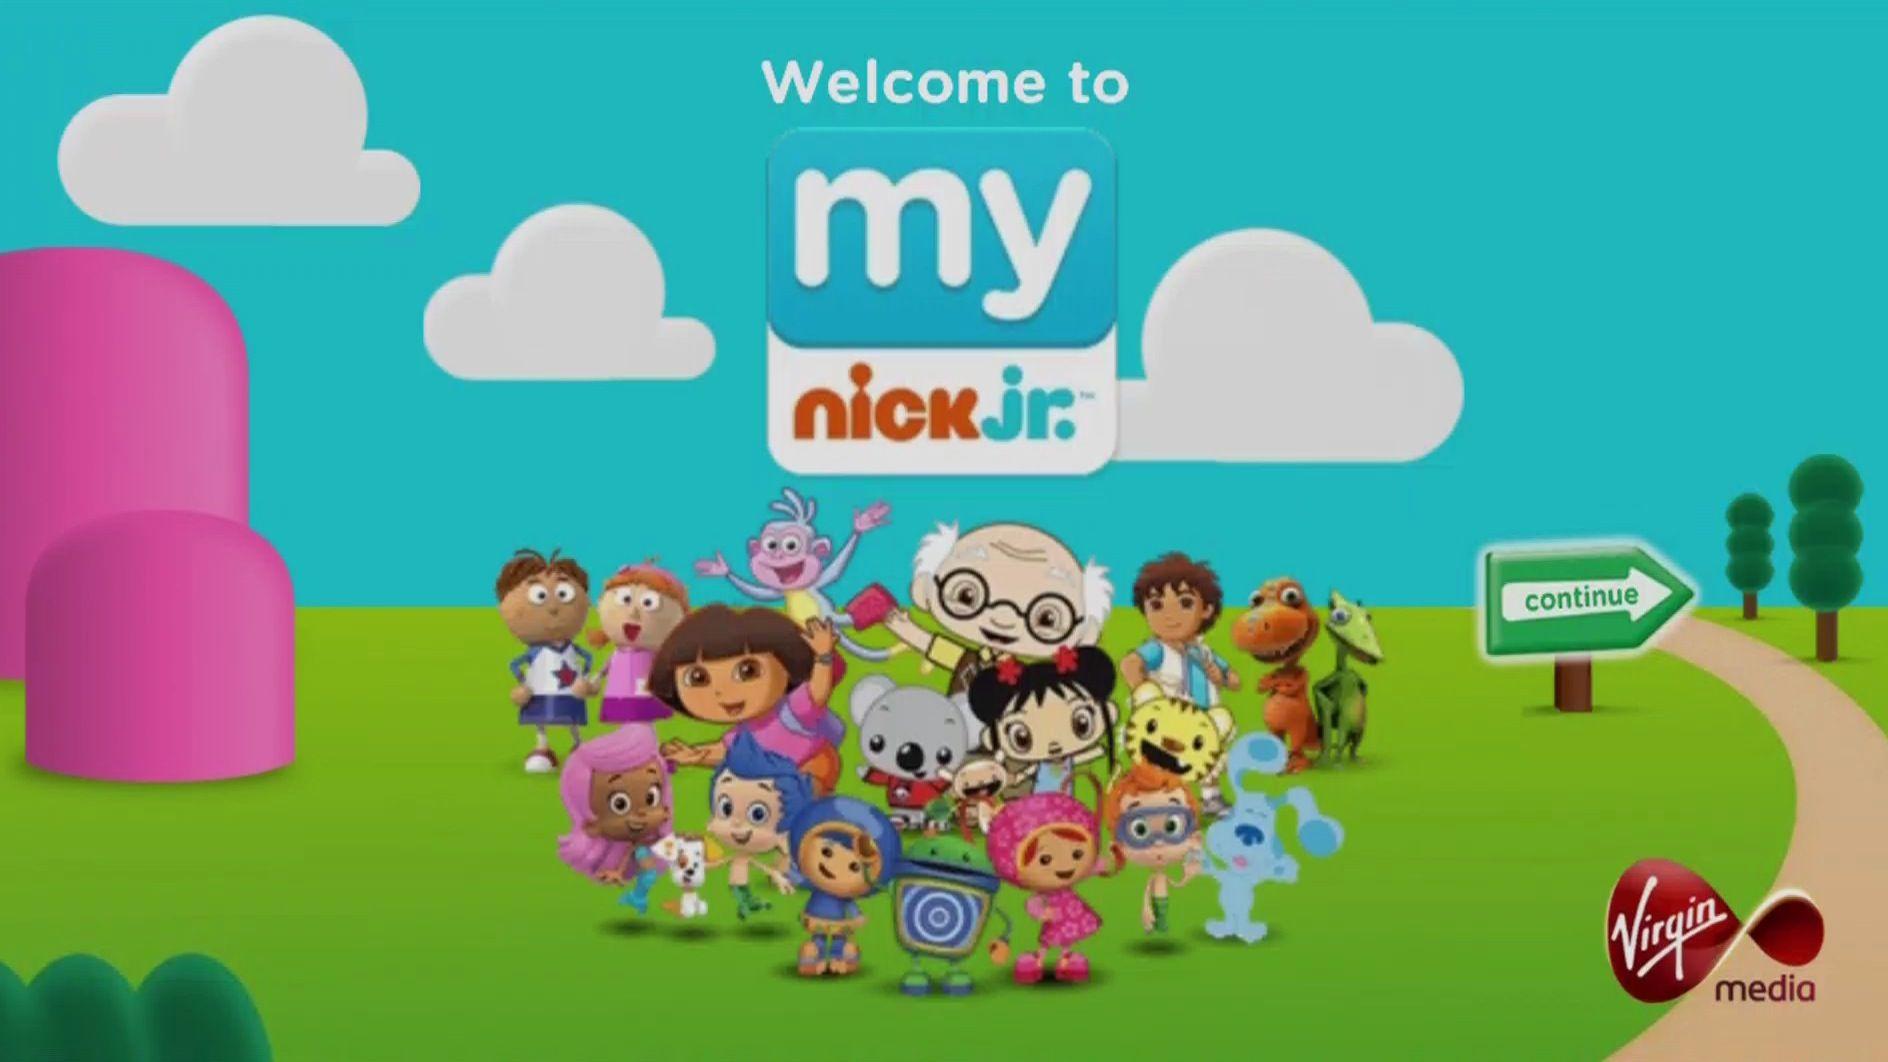 http://www.nickjr.com/home-life/kids-money/teaching-money/teaching ...